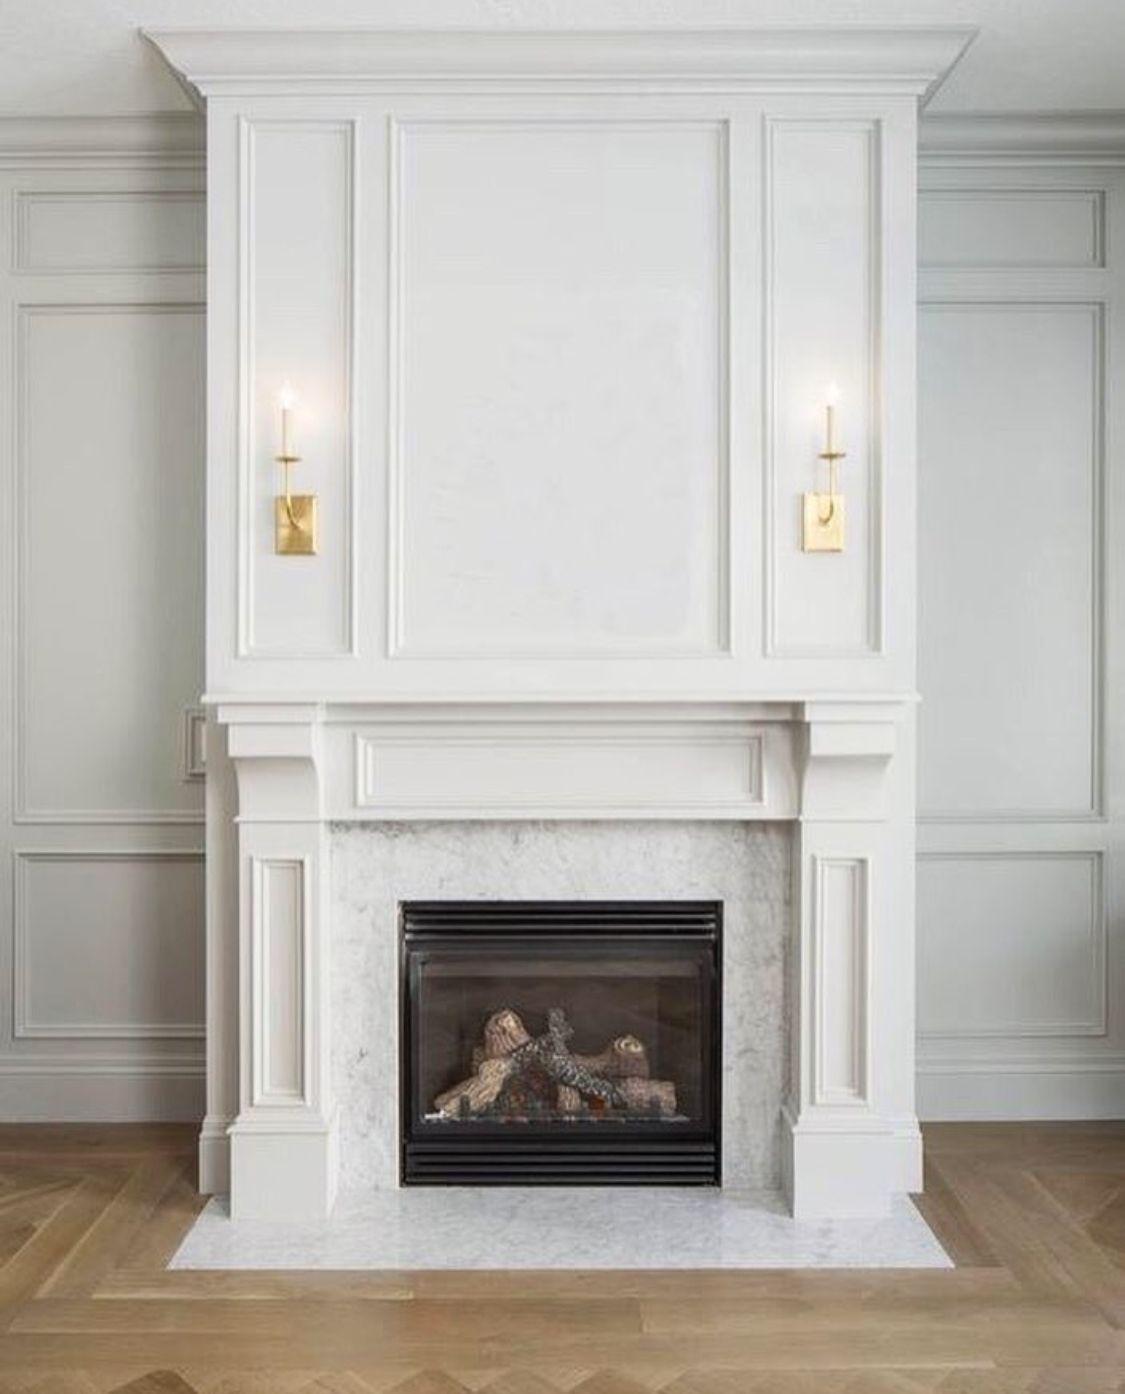 fireplace fireplace mantle ideas fireplace design marble rh pinterest com